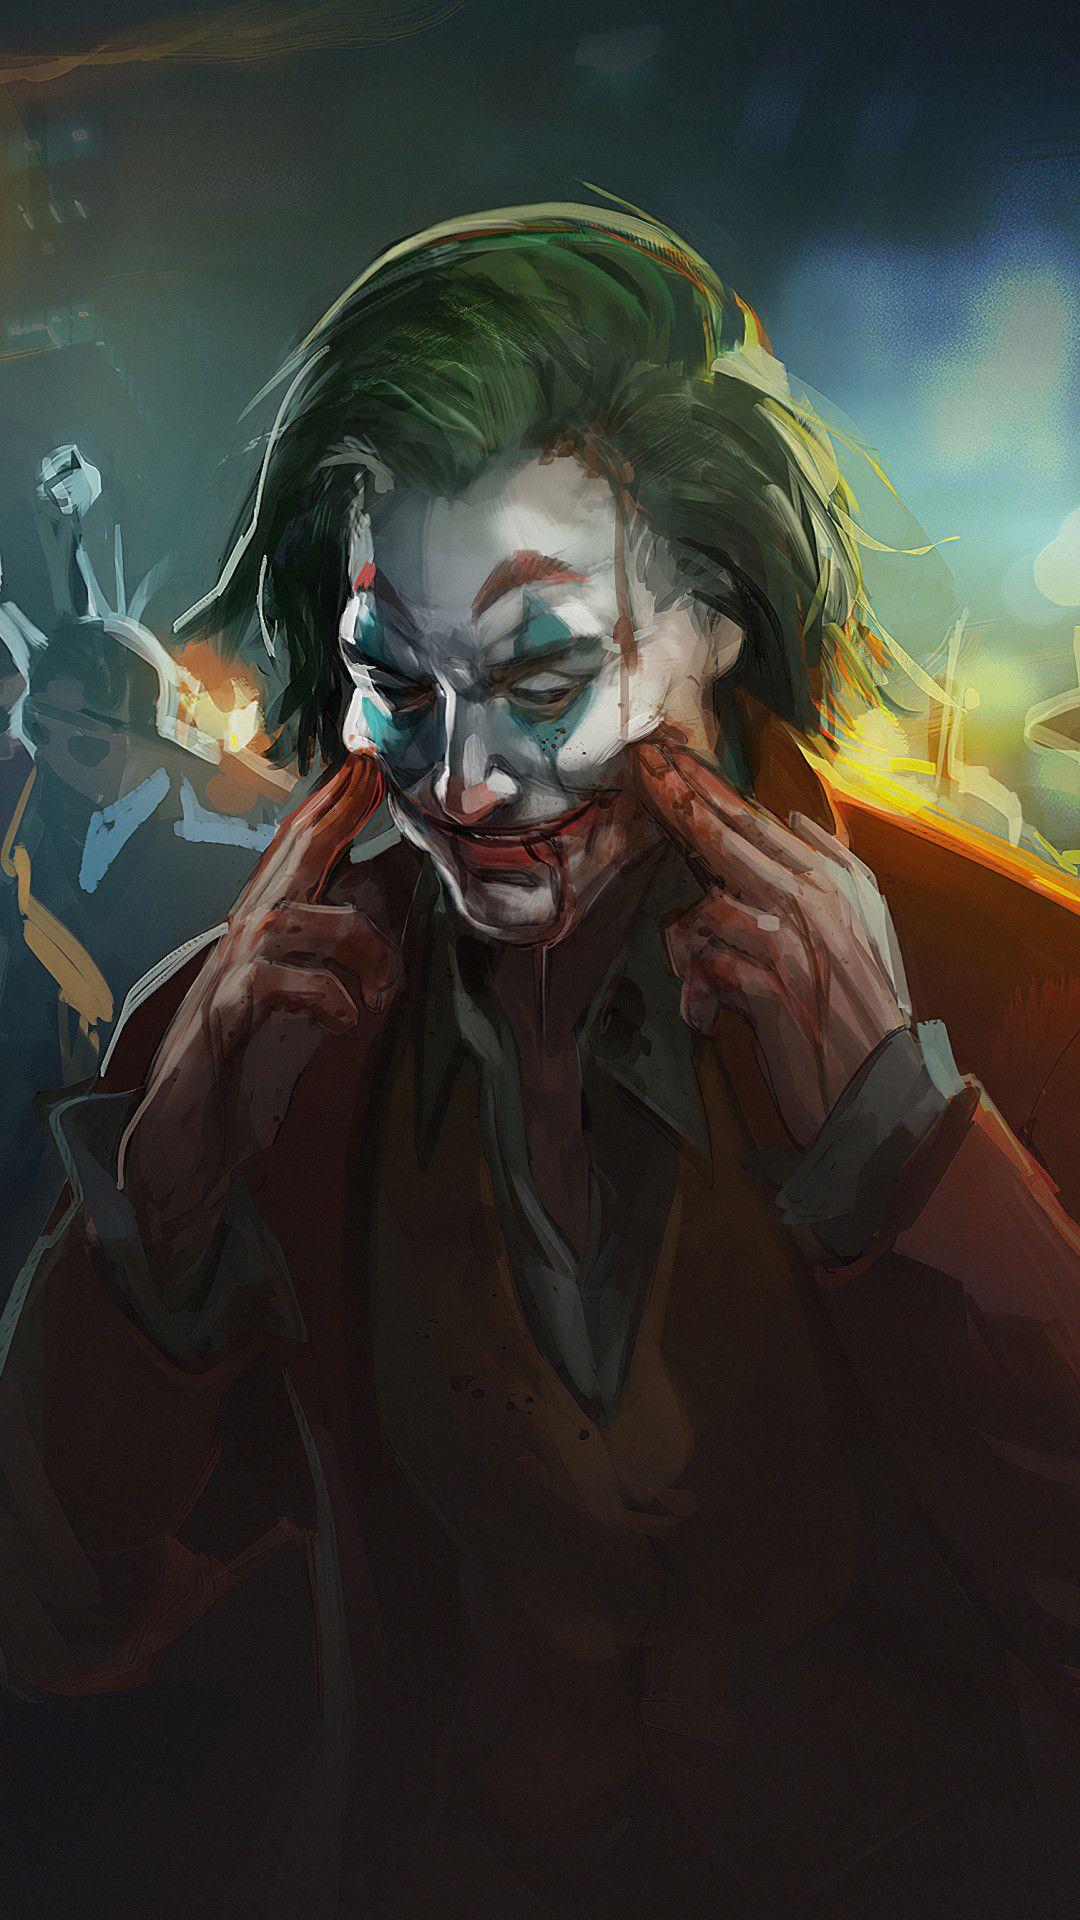 Joker Always Smile 4k Mobile Wallpaper (iPhone, Android